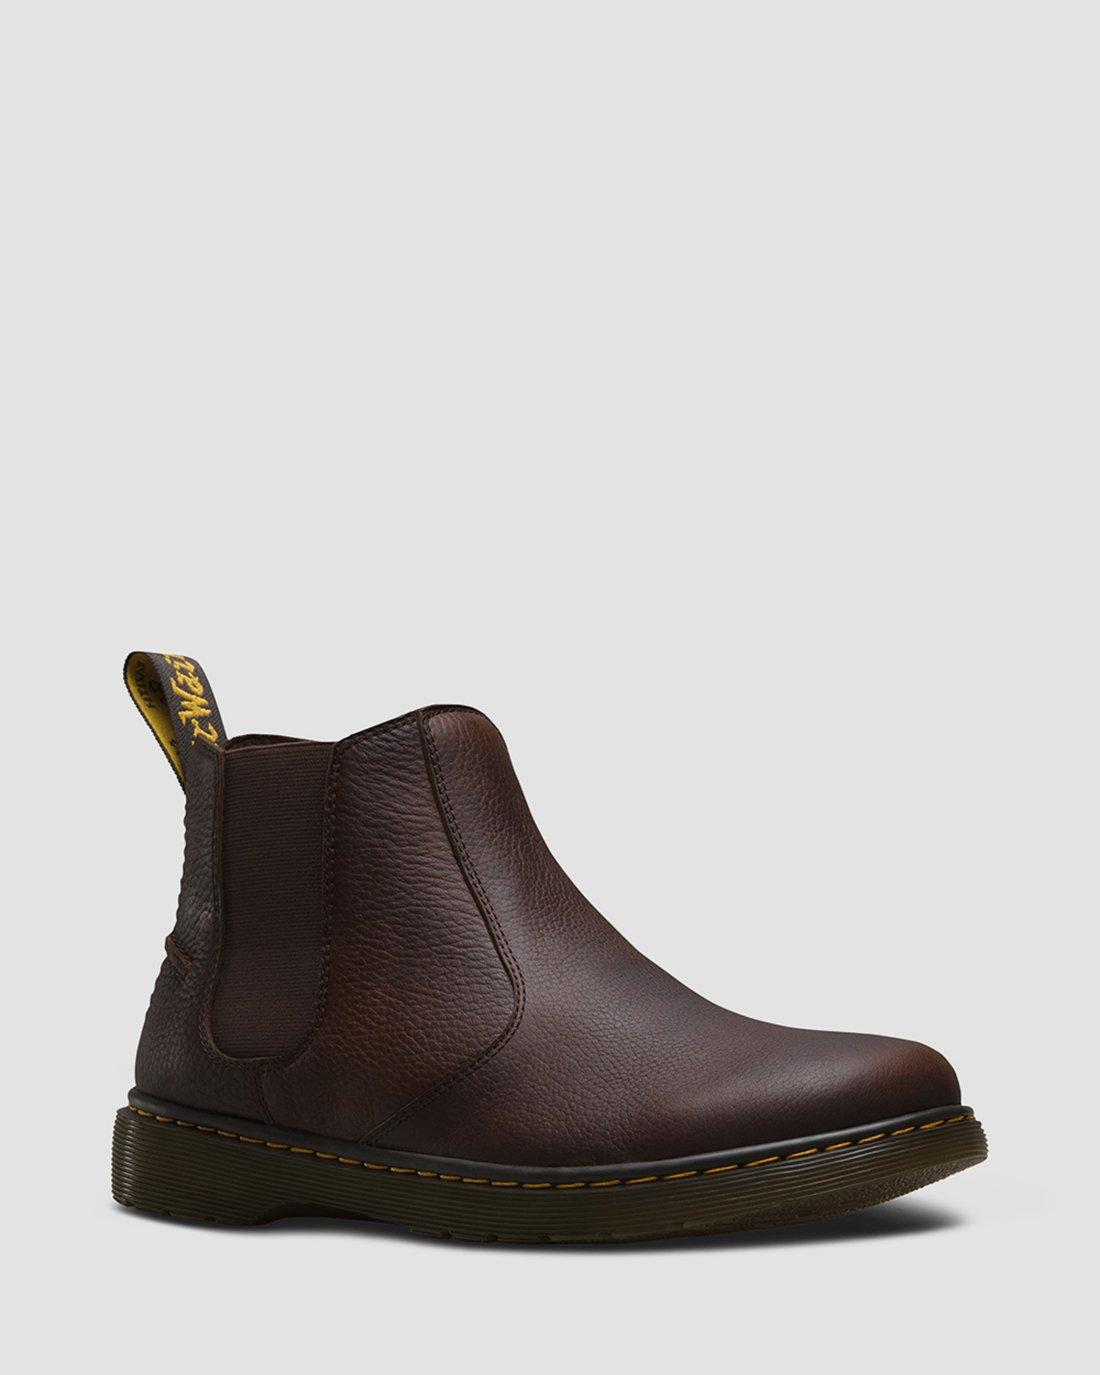 Mens Dr Martens DM Revive Lyme Black Grizzly Leather Chelsea Boots Size